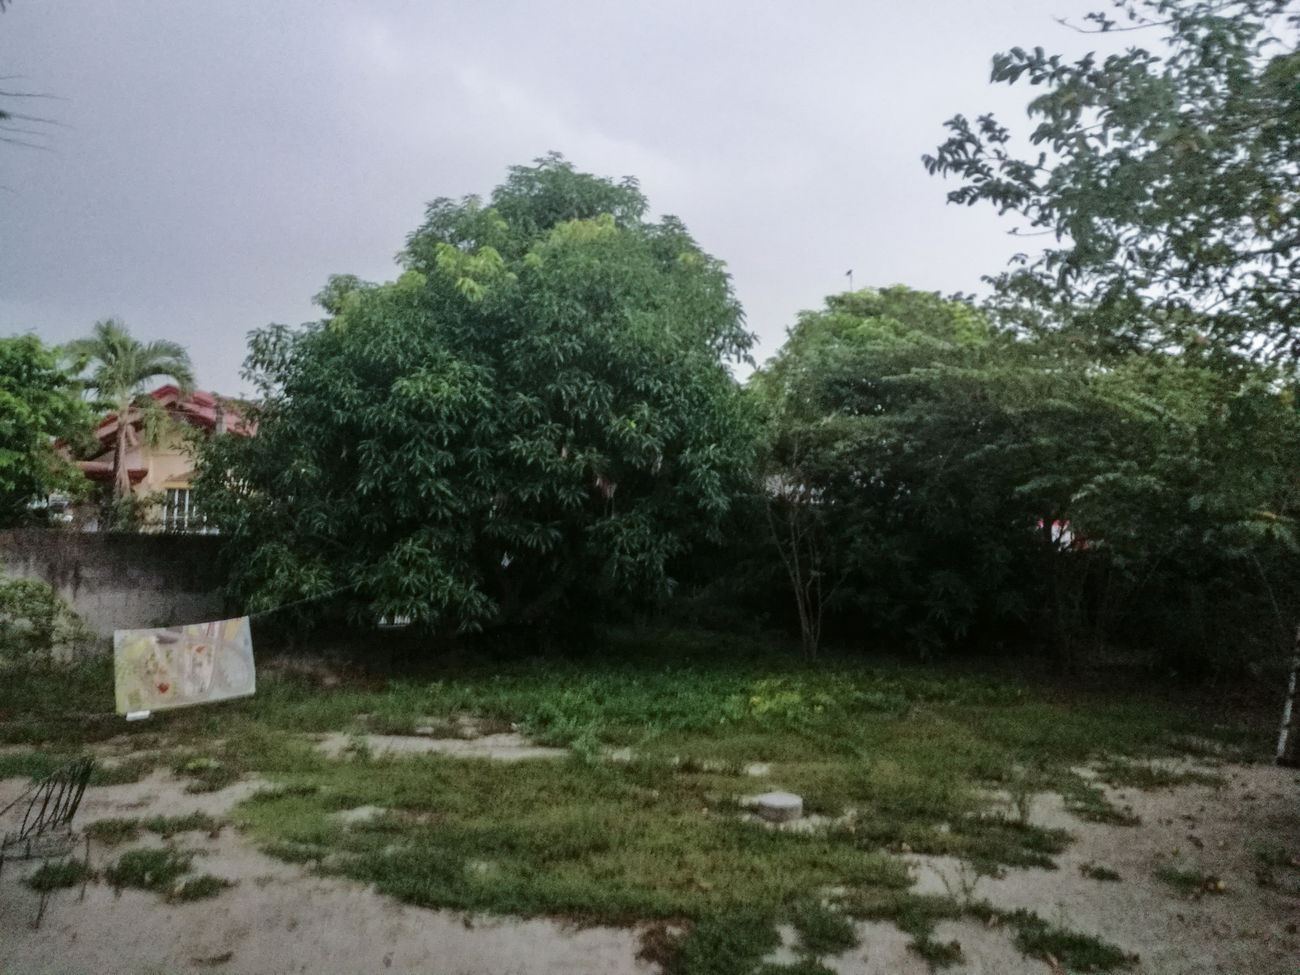 Now its gloomy Tree Outdoors Sky Gloomy Weather